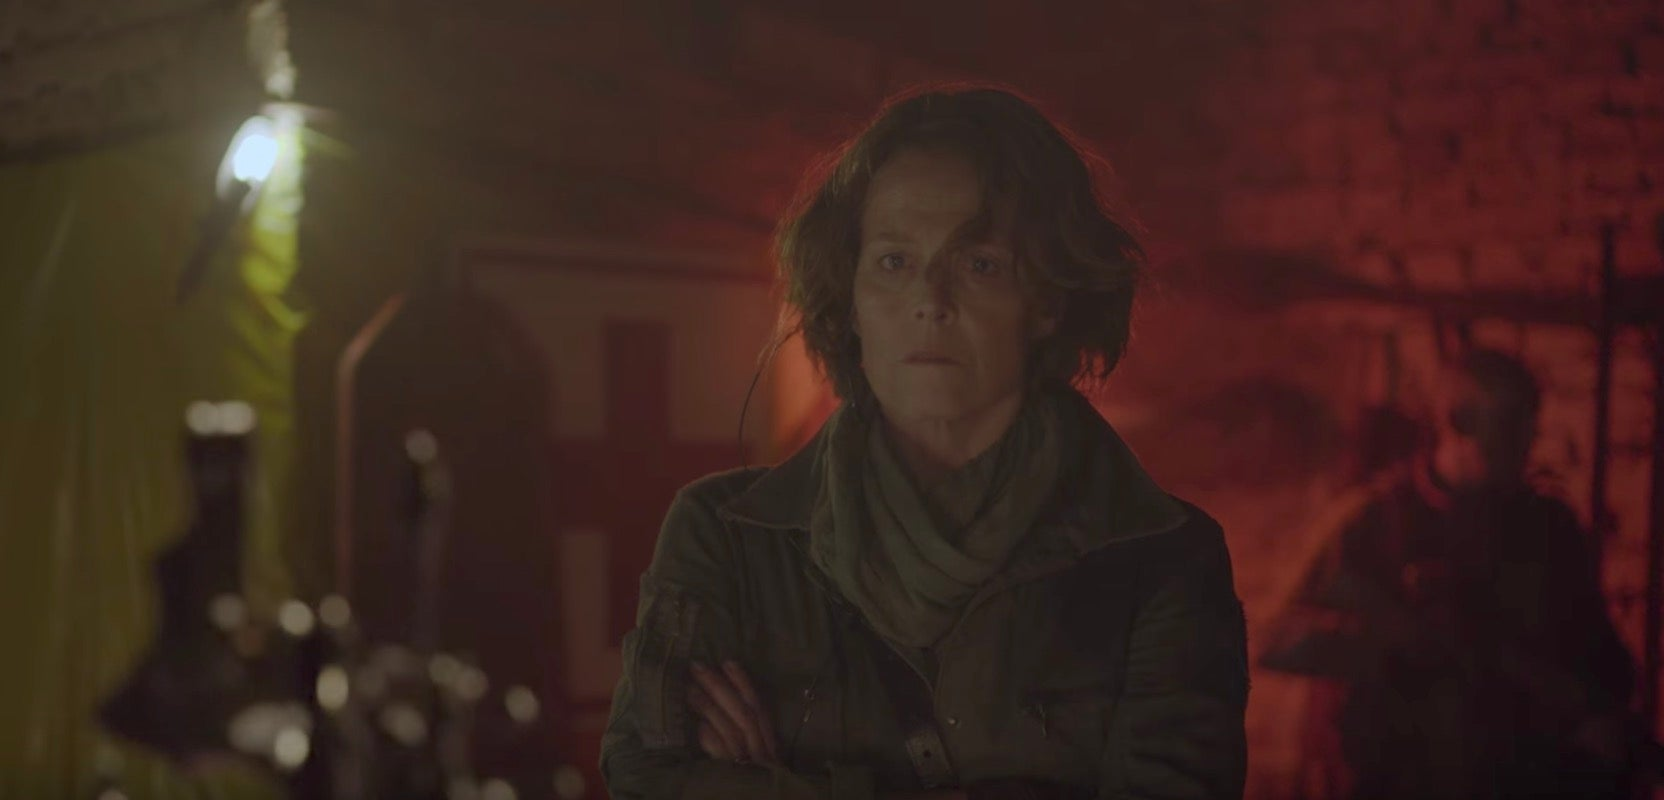 Sigourney Weaver Pops Up In A Weird New Trailer For Neill Blomkamp's Short Film Project